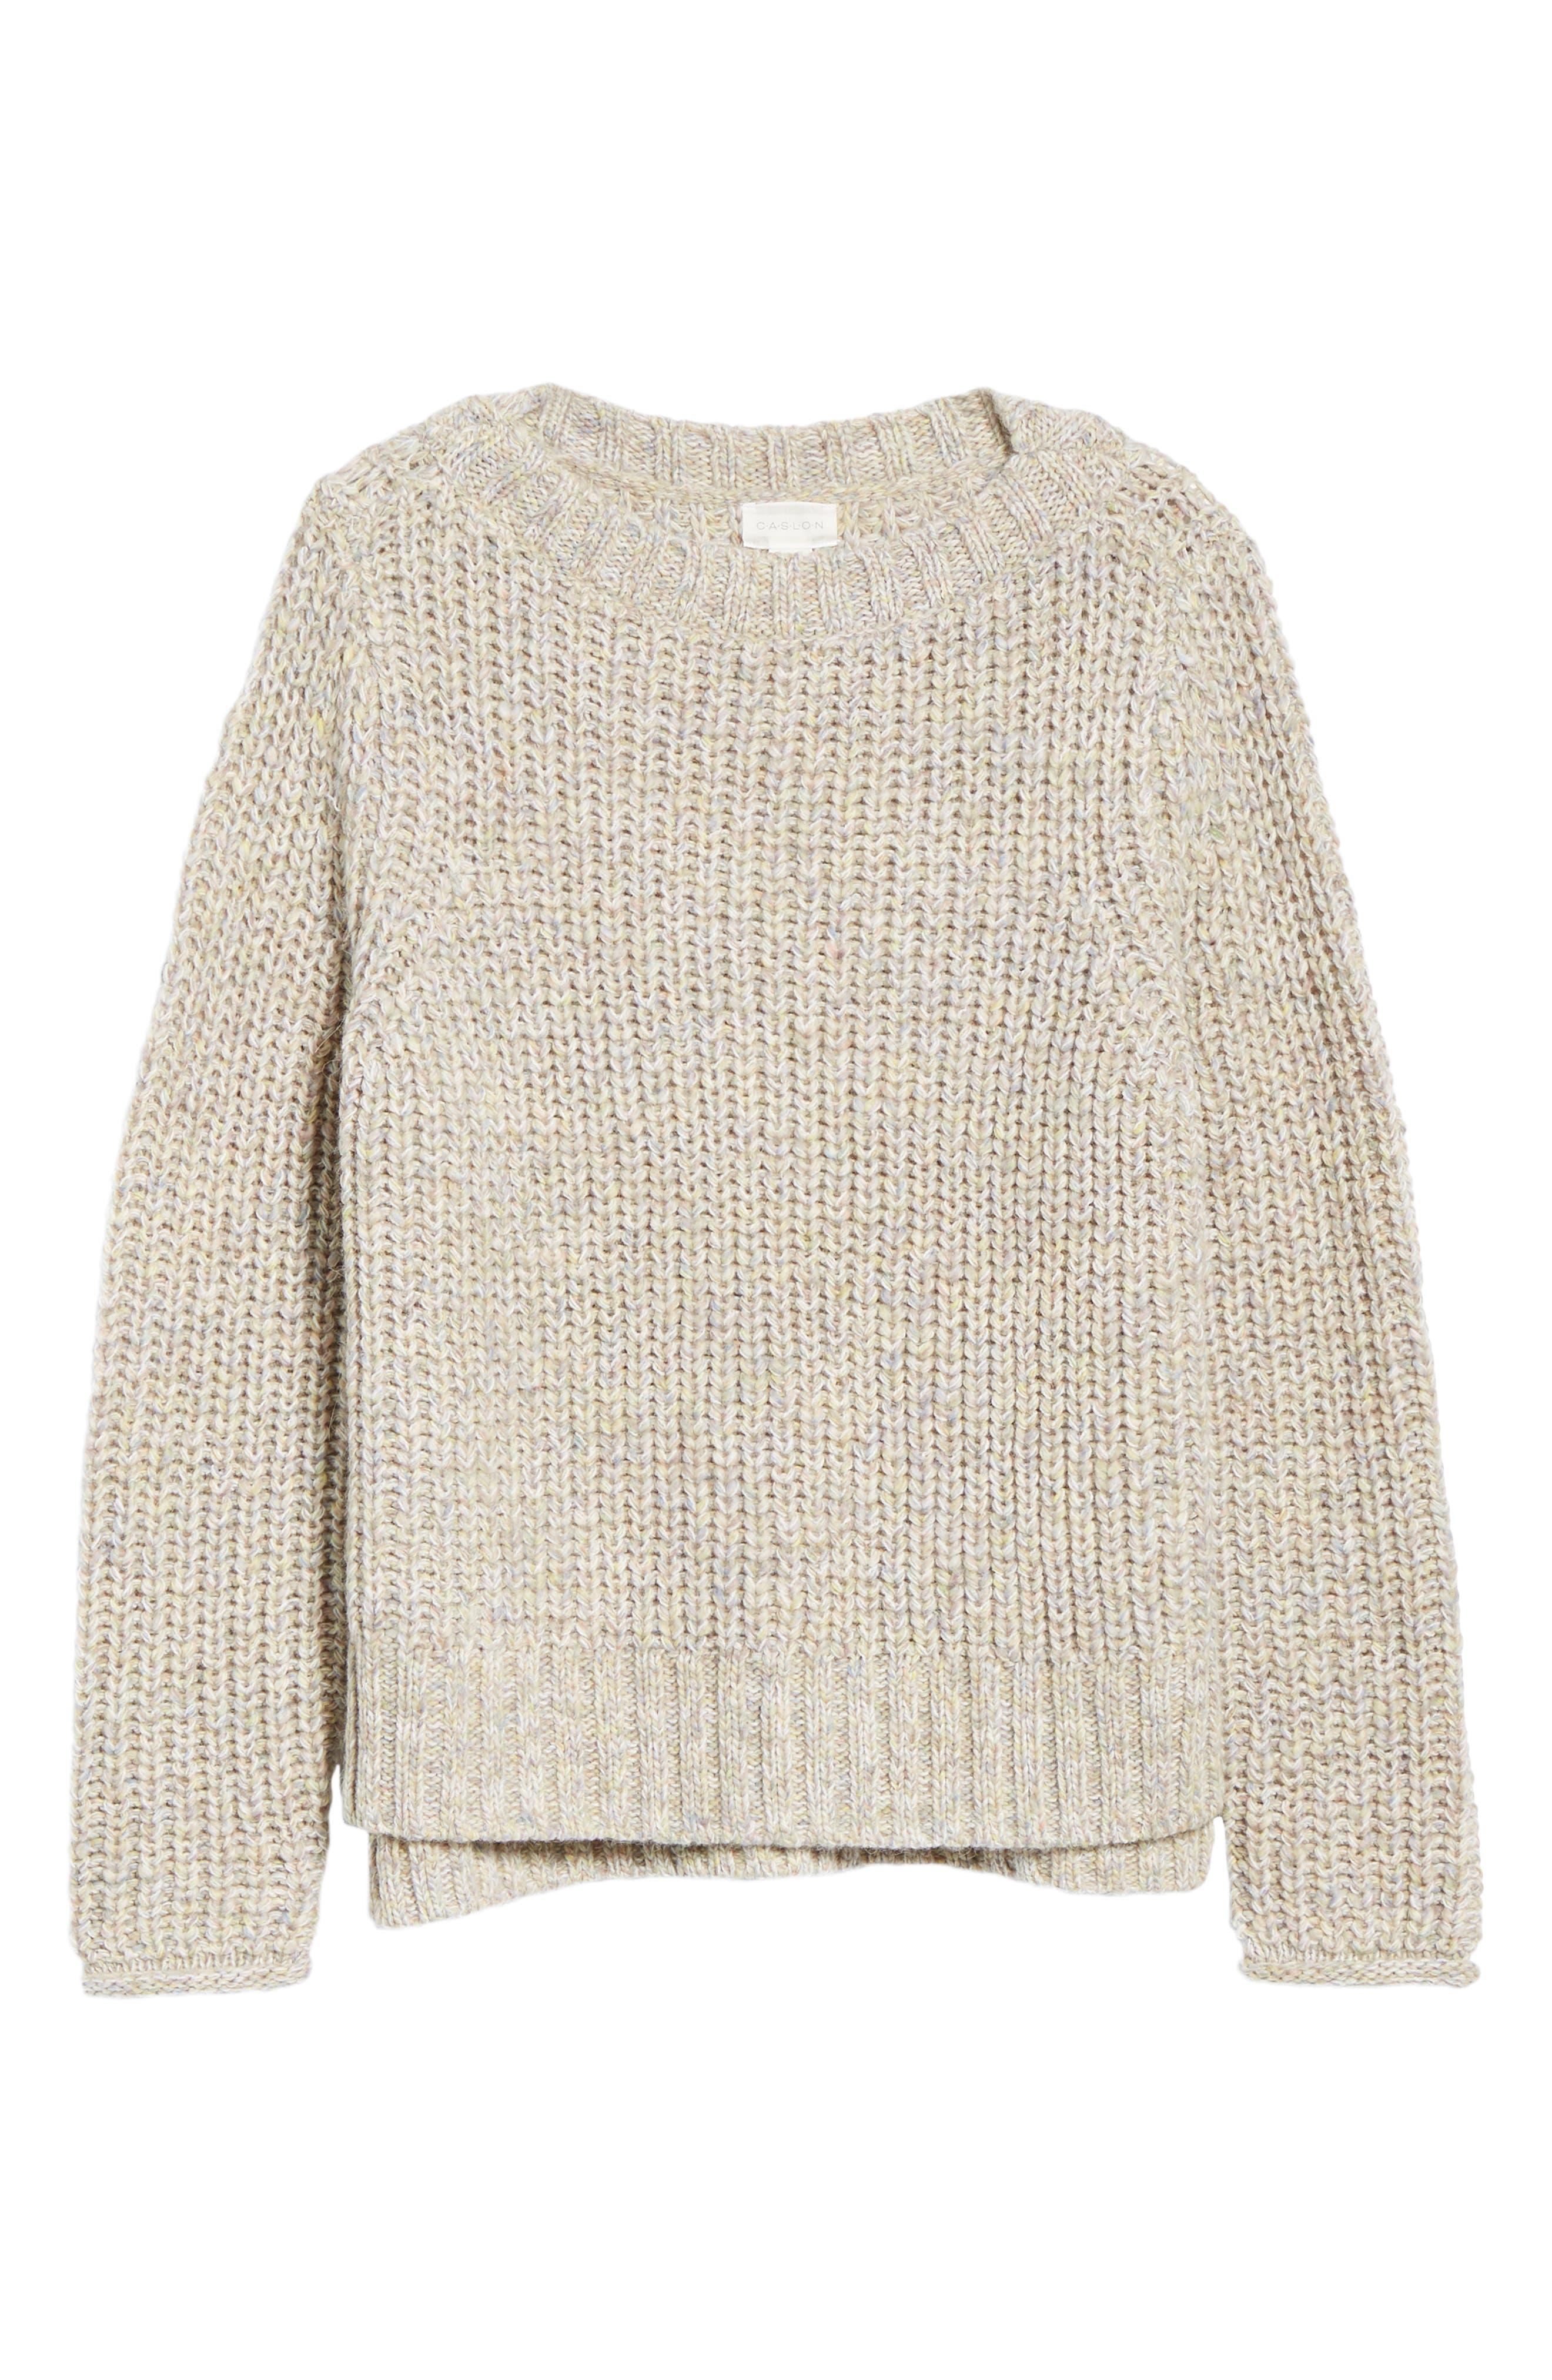 Boat Neck Sweater,                             Alternate thumbnail 6, color,                             BEIGE POPCORN PATTERN